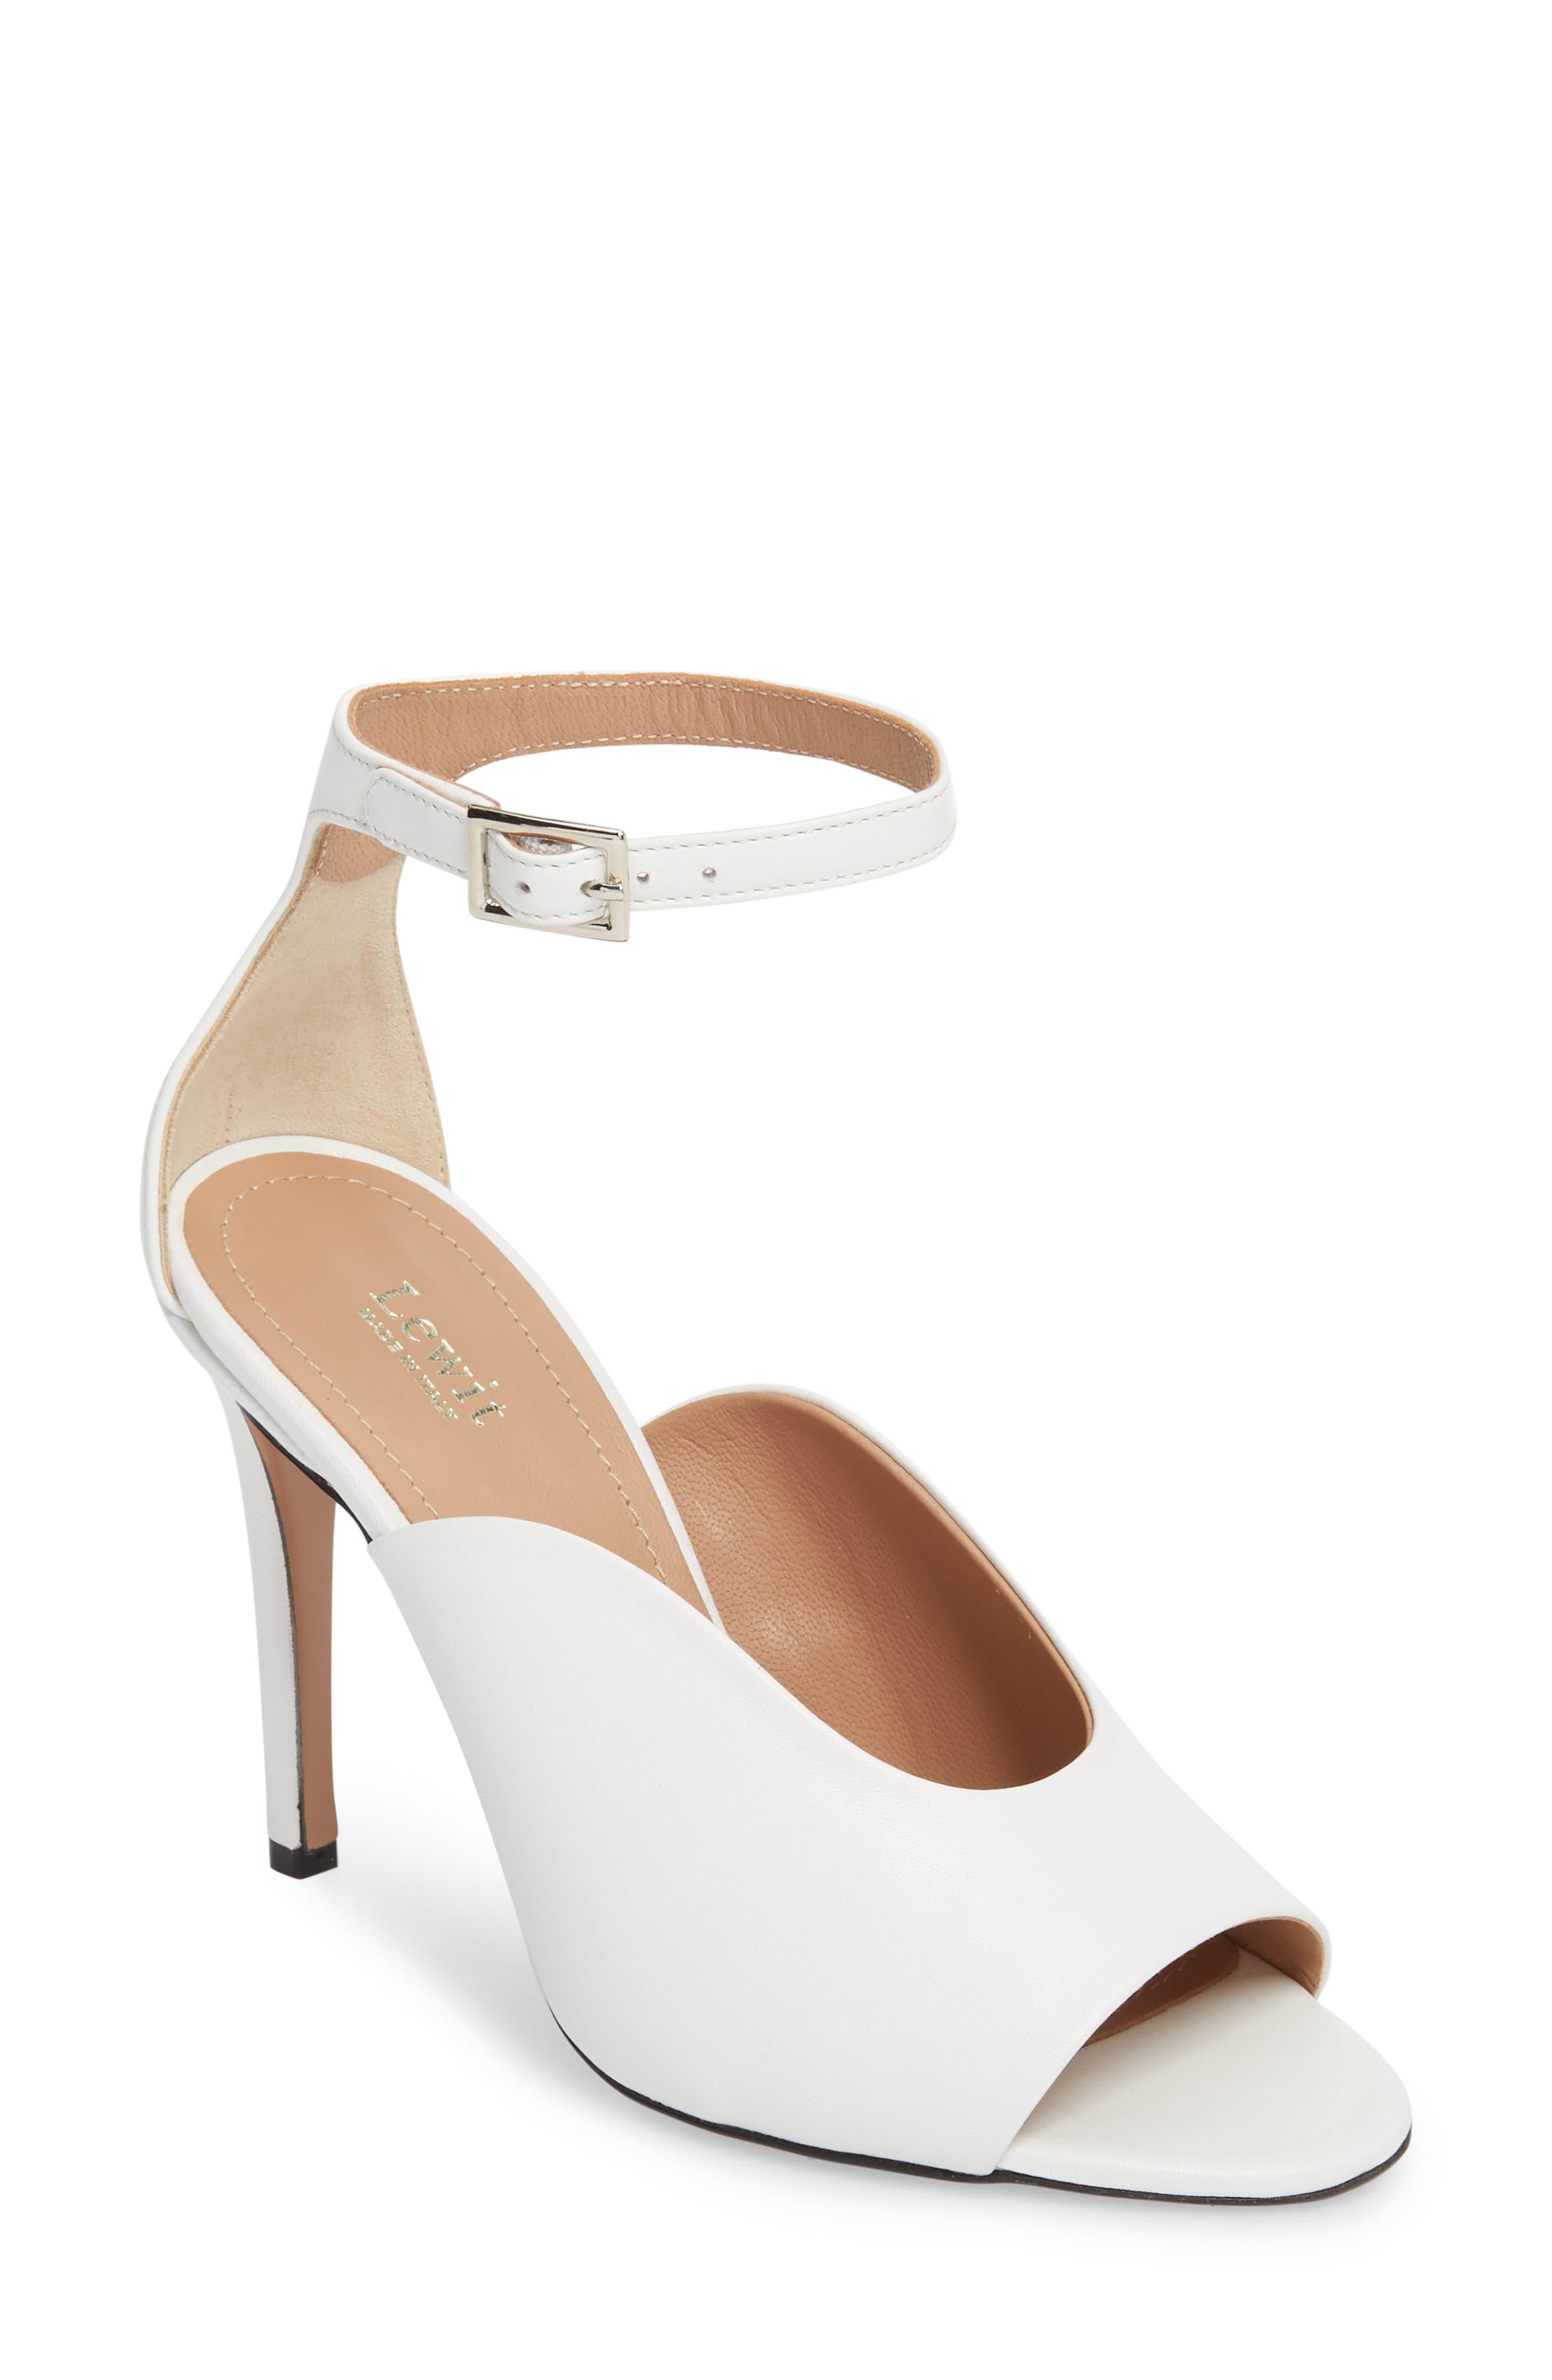 Rosalia Halo Strap Sandal,                             Main thumbnail 1, color,                             White Leather